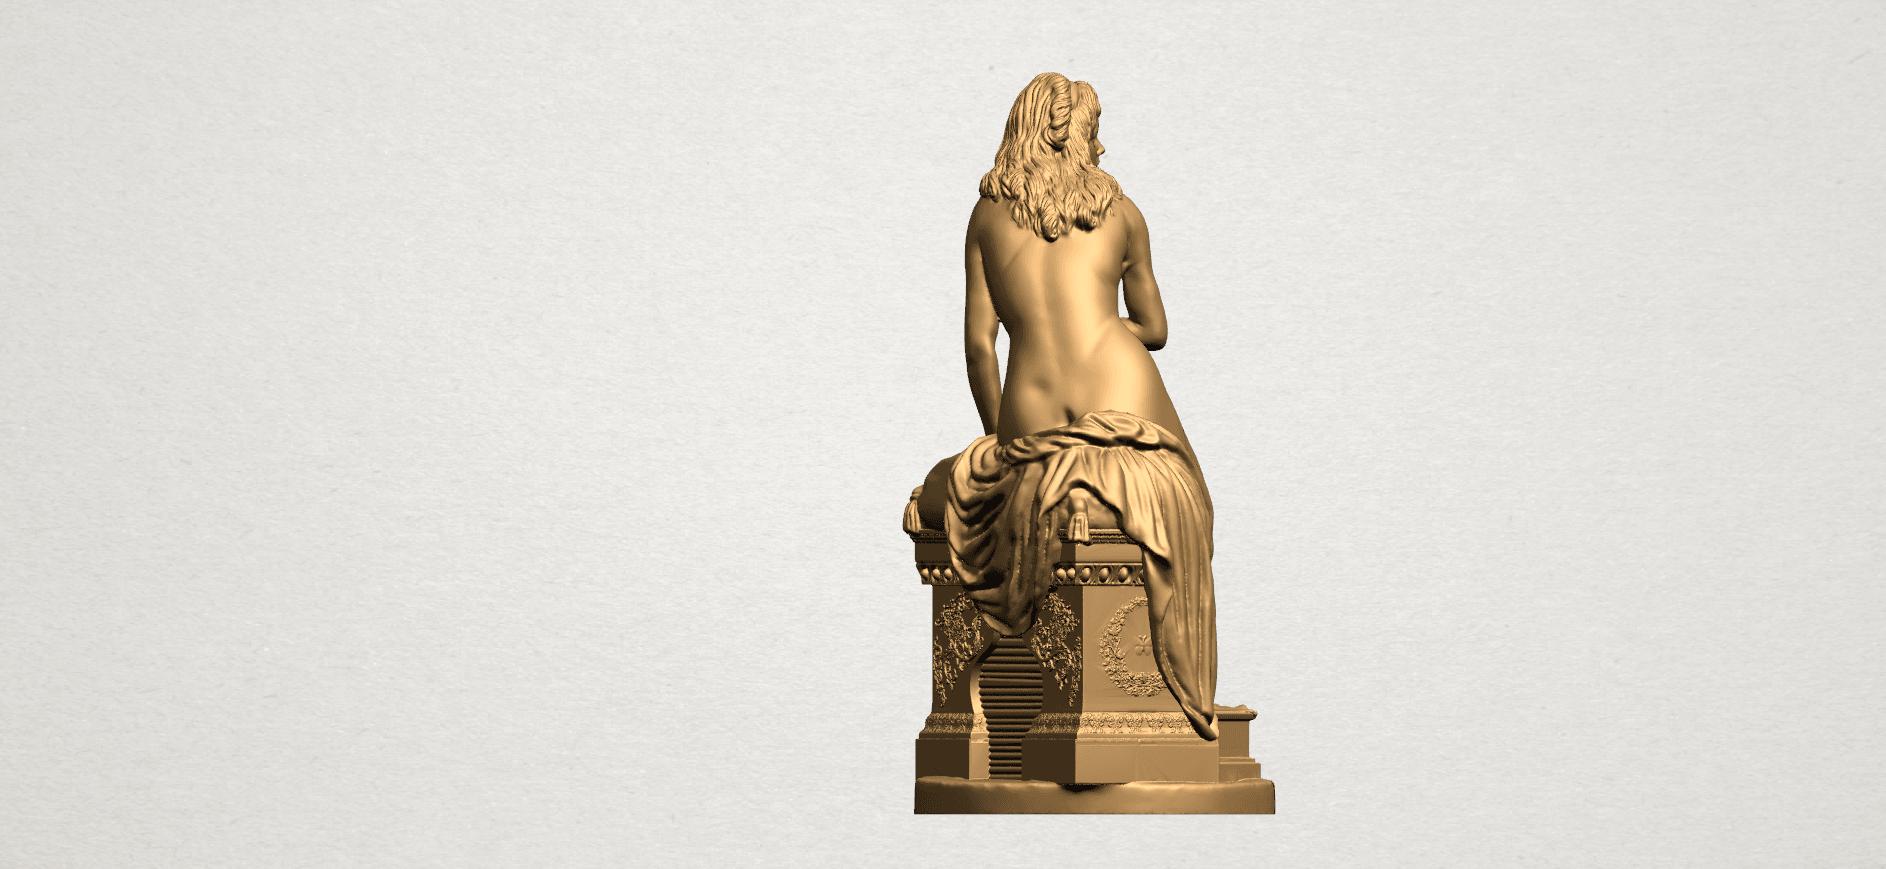 Naked Girl (i) B06.png Download free STL file Naked Girl 01 • 3D printing model, GeorgesNikkei